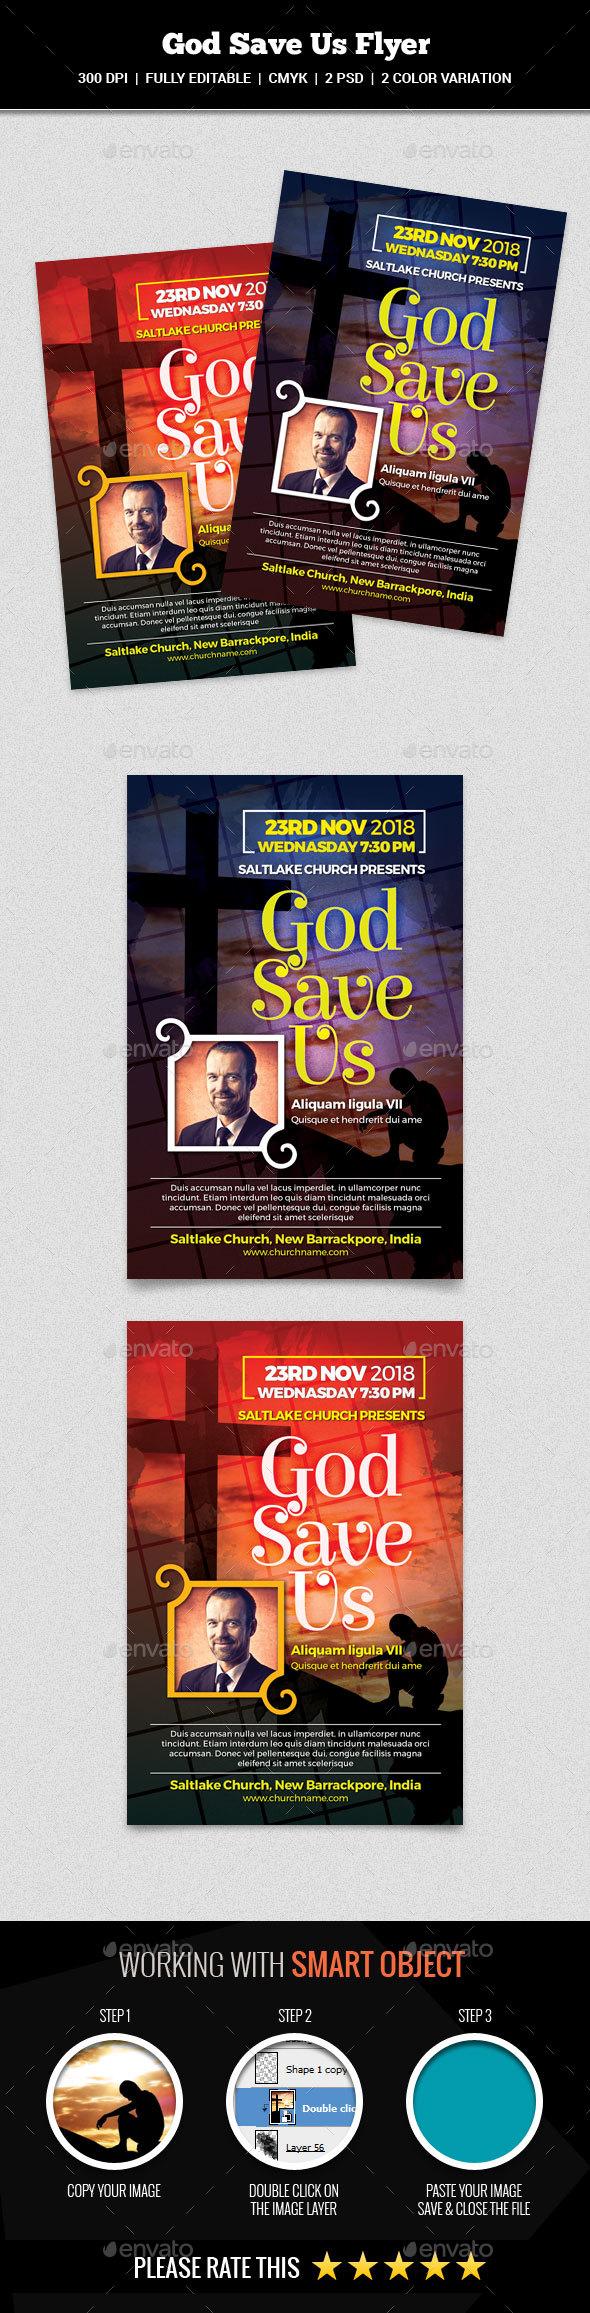 God Save Us Flyer - Church Flyers